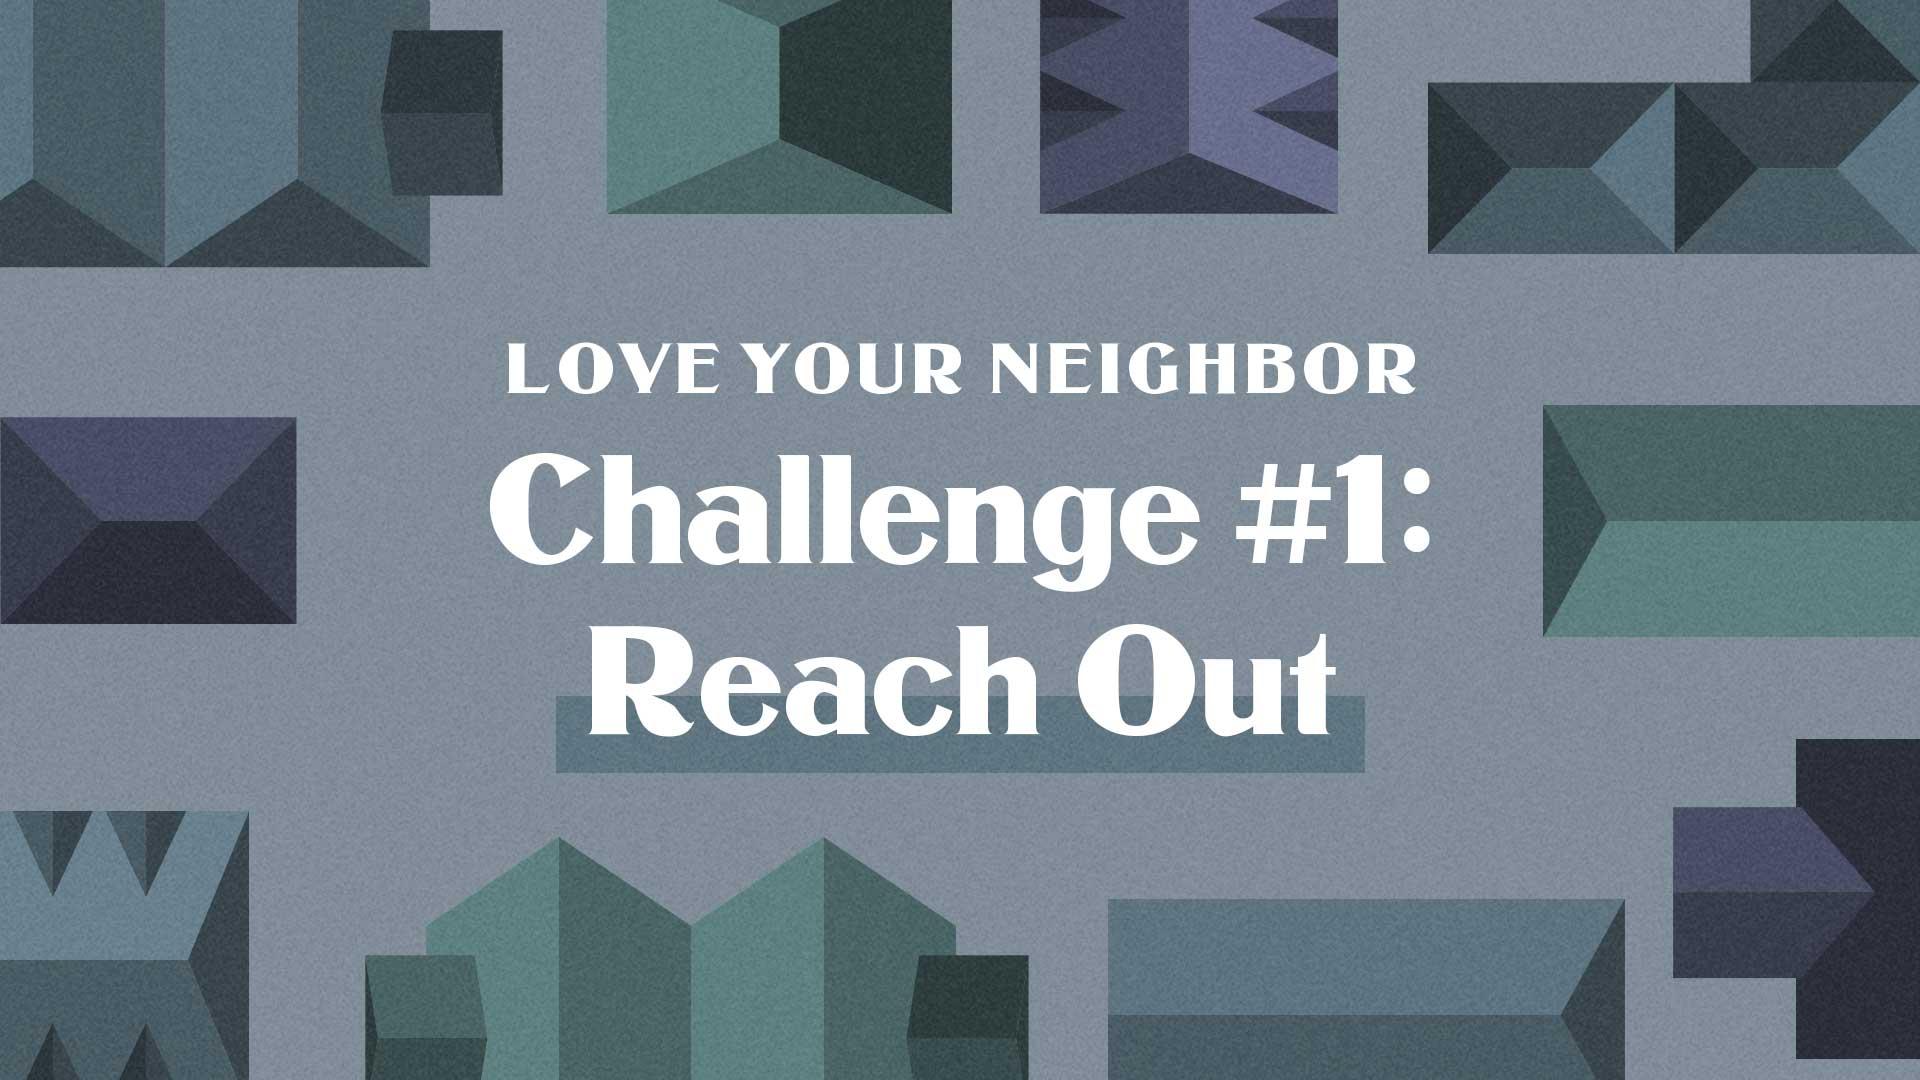 Love Your Neighbor Challenge #1